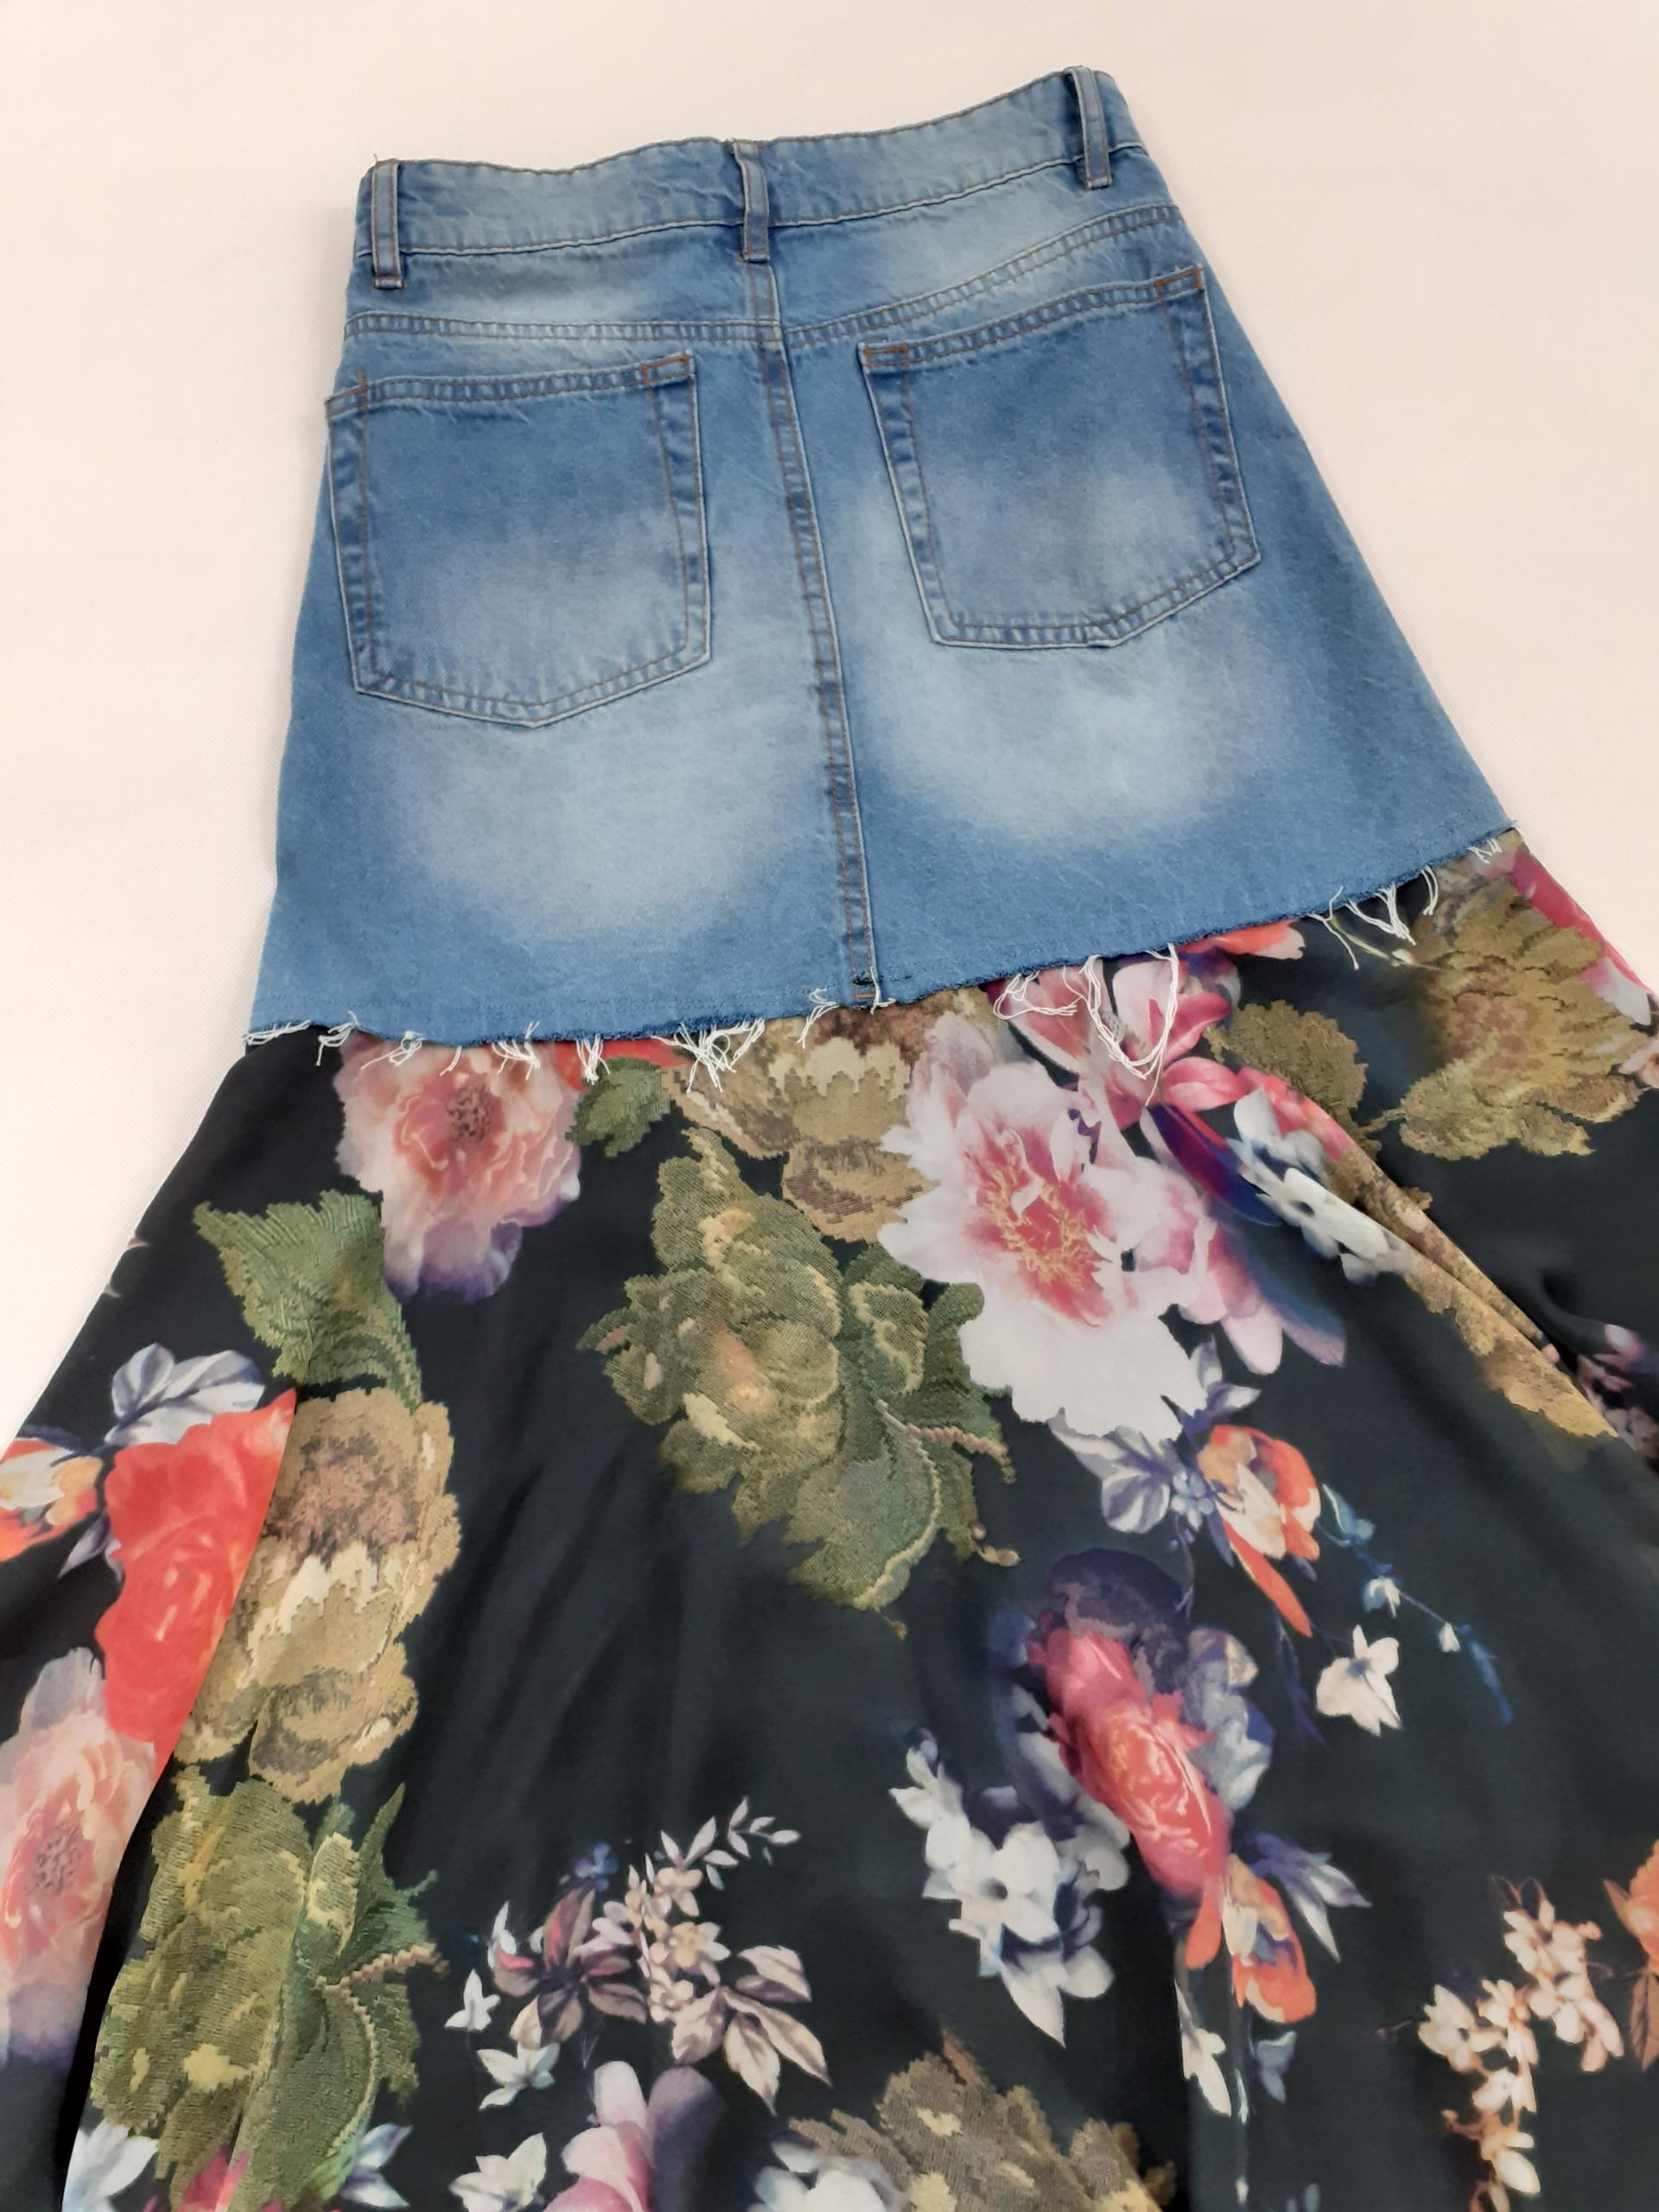 Długa spódnica jeans  maxi  tiul żorżeta  R 36